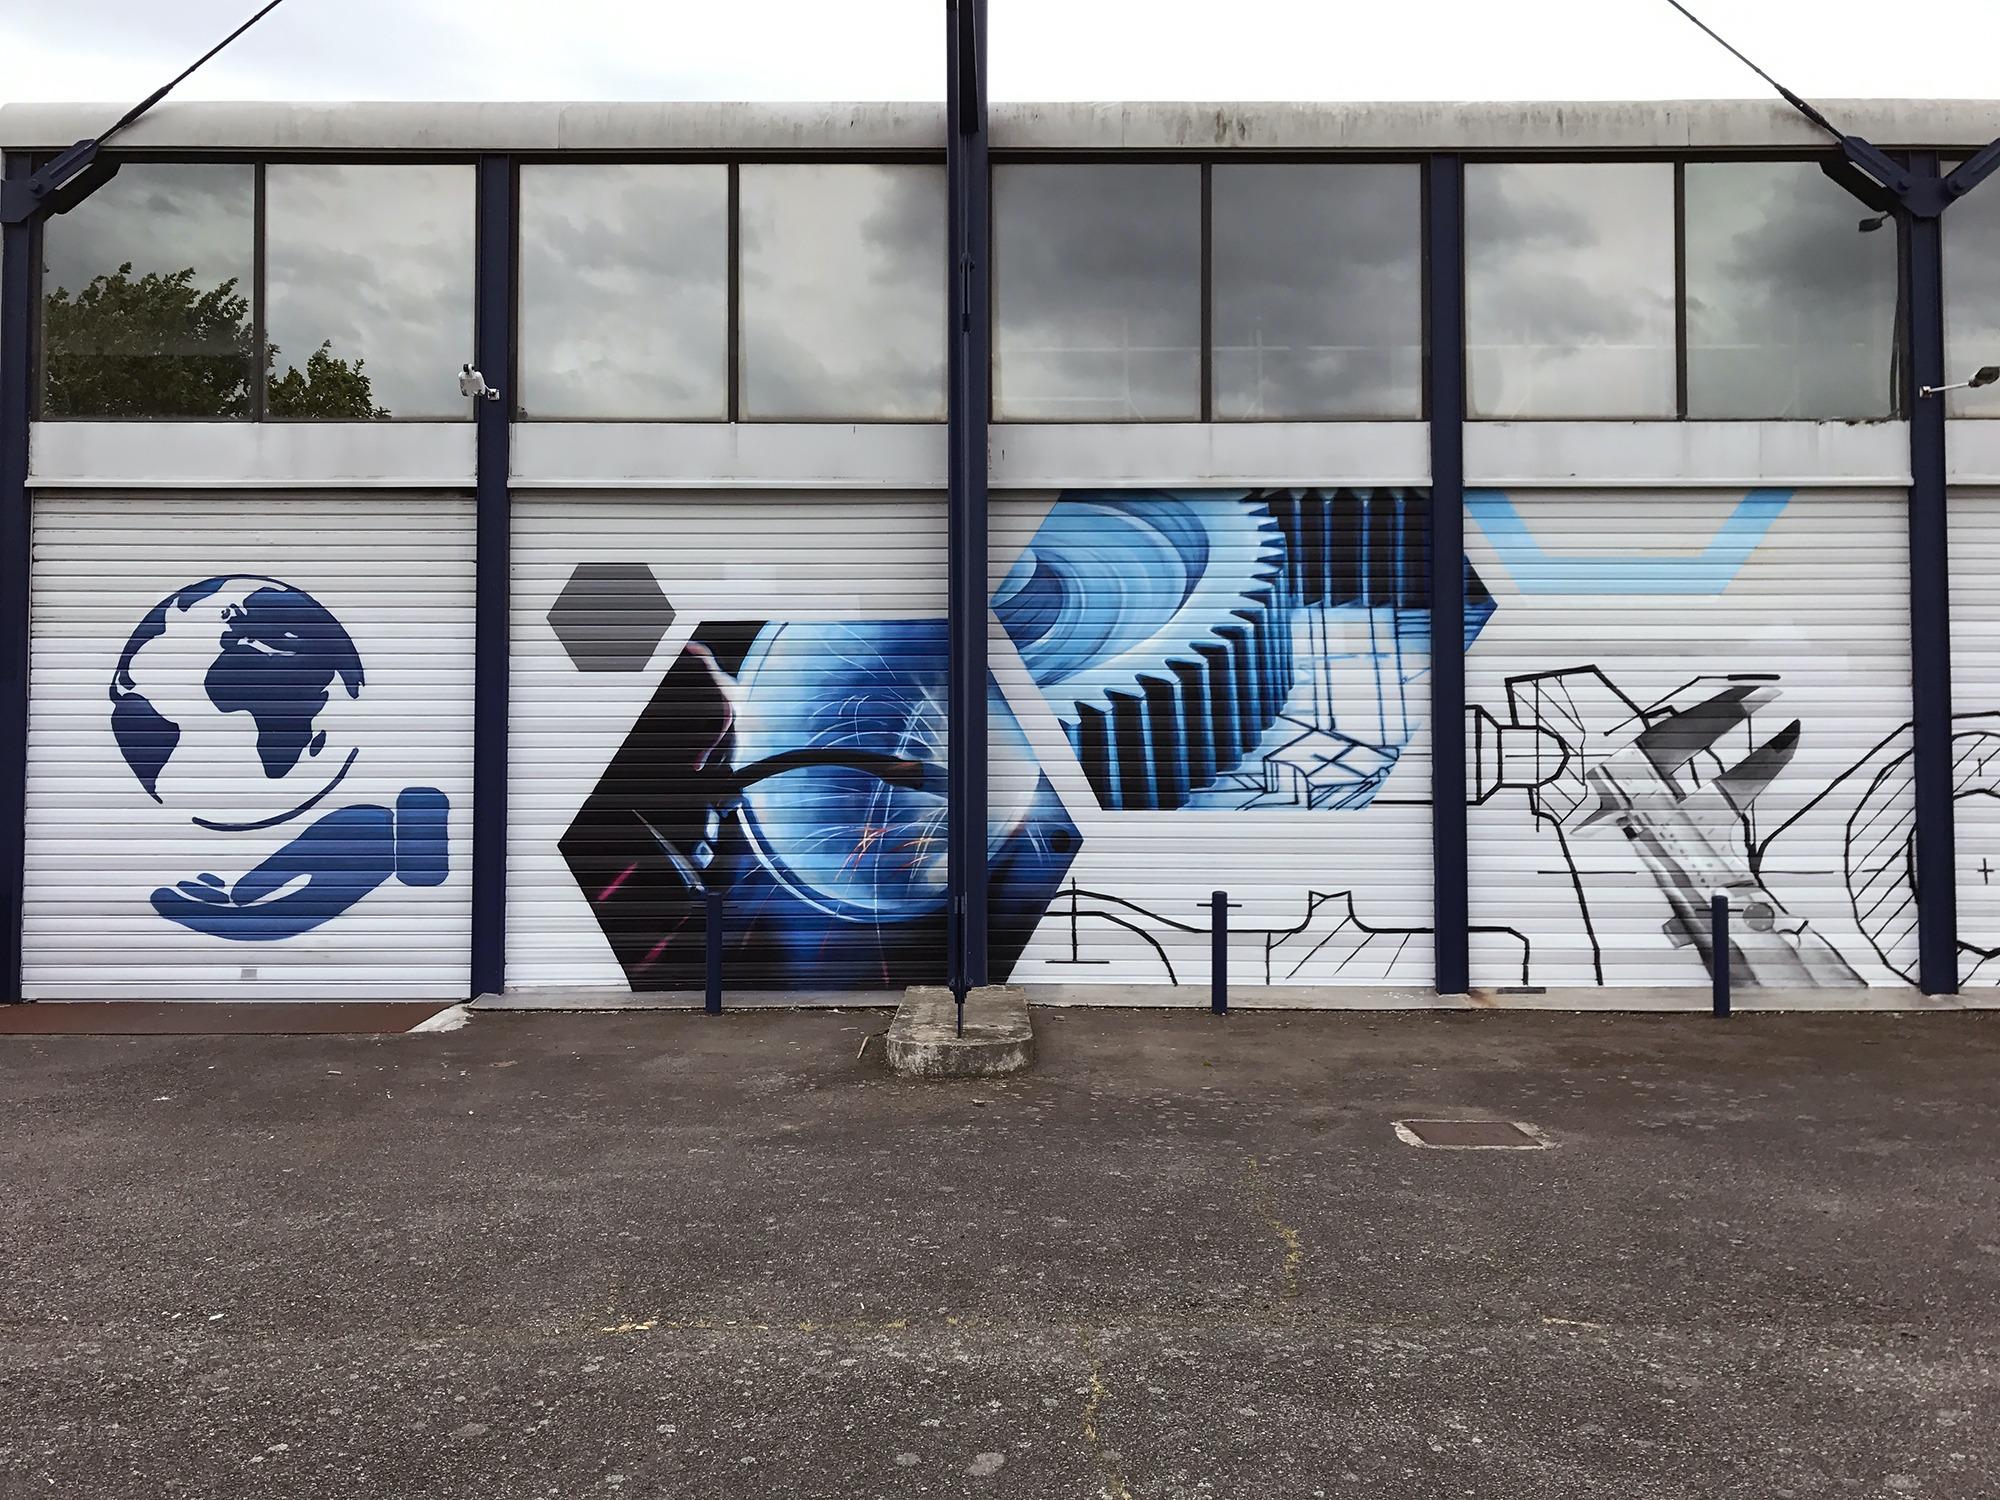 Fresque-Aeronautique-innovation-decoration-facade